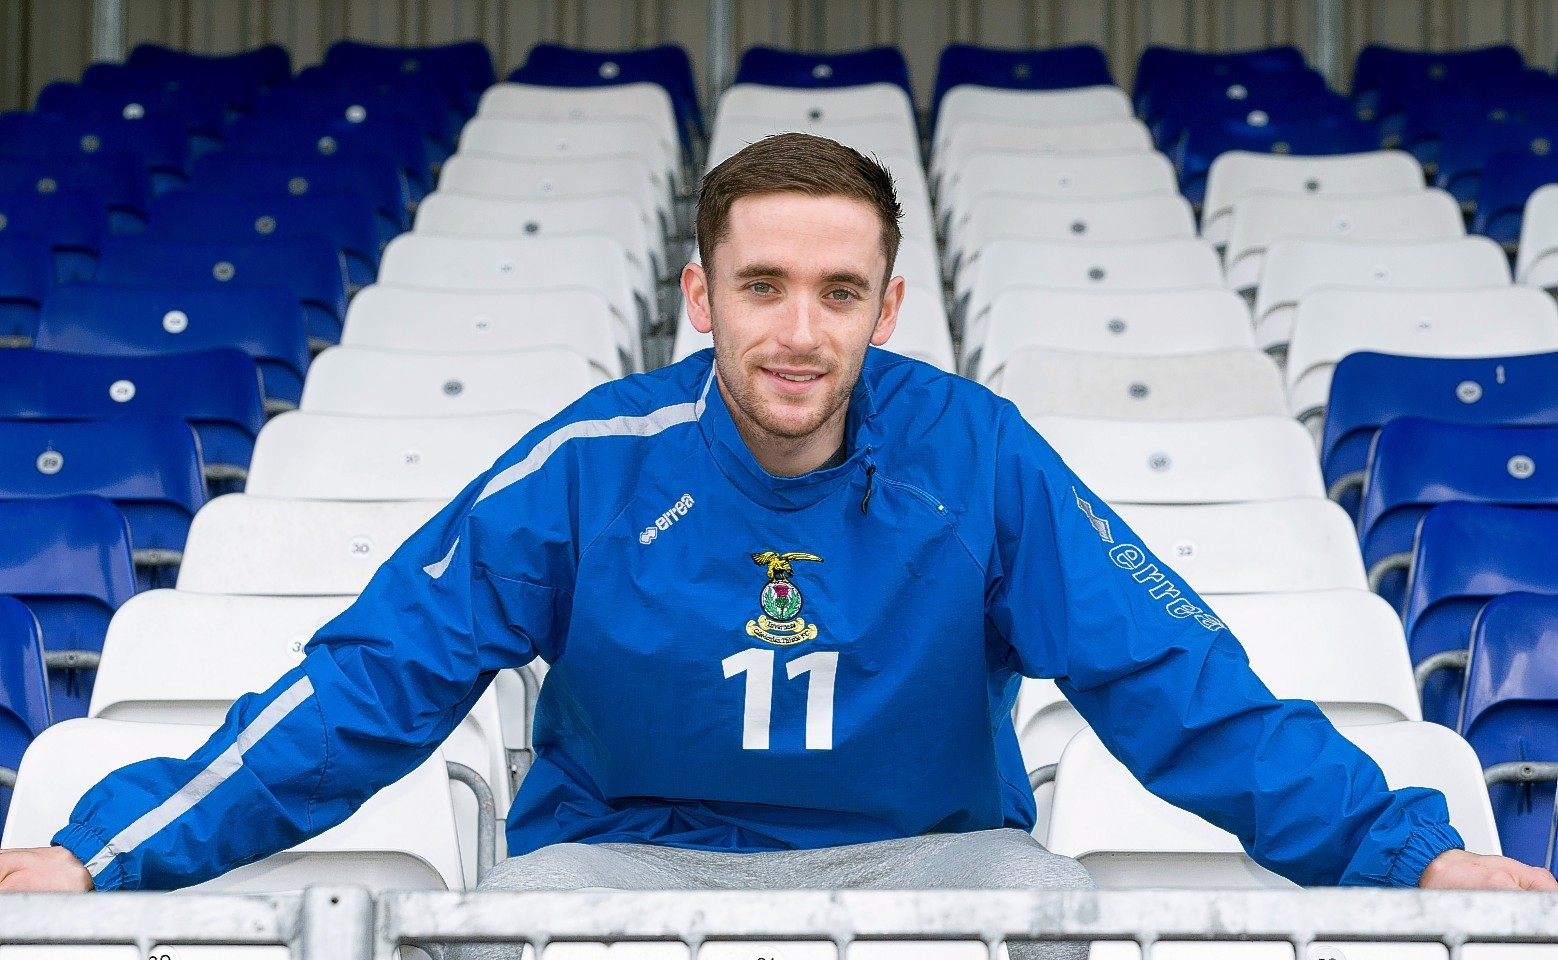 Caley Thistle midfielder Nick Ross